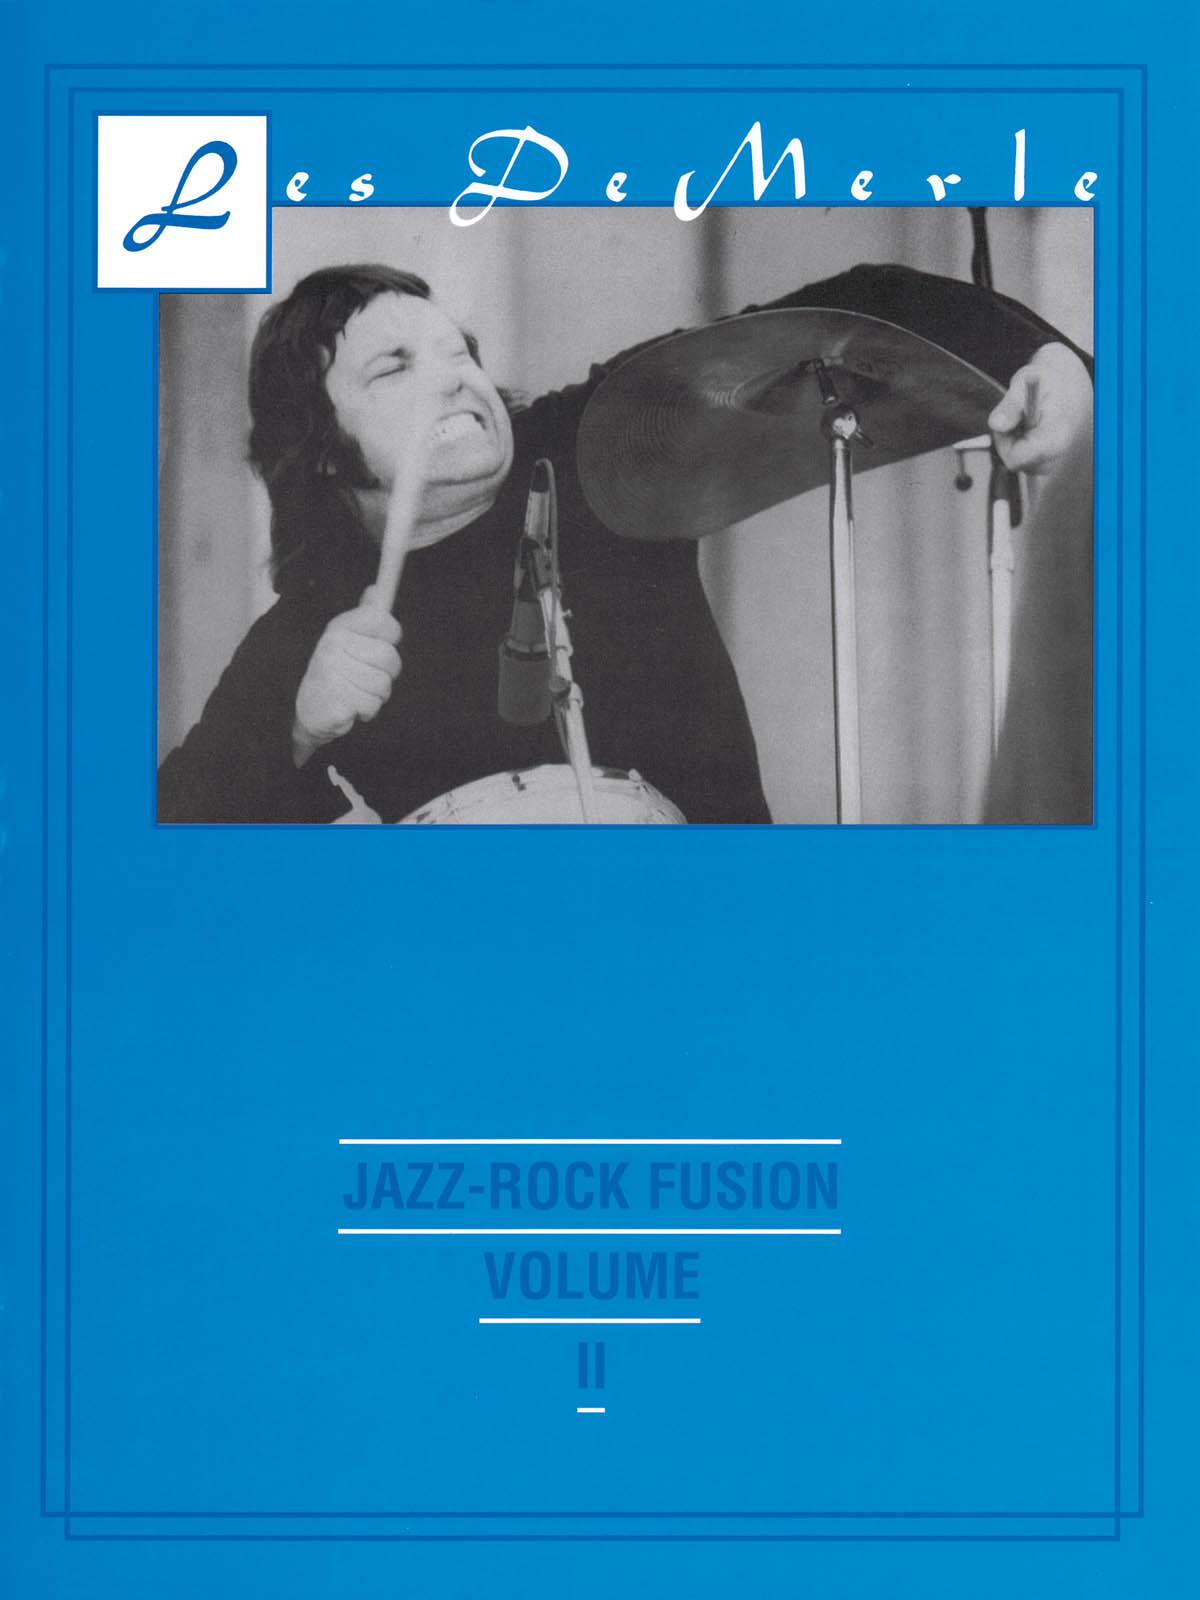 Jazz-Rock Fusion: Other Percussion: Instrumental Album